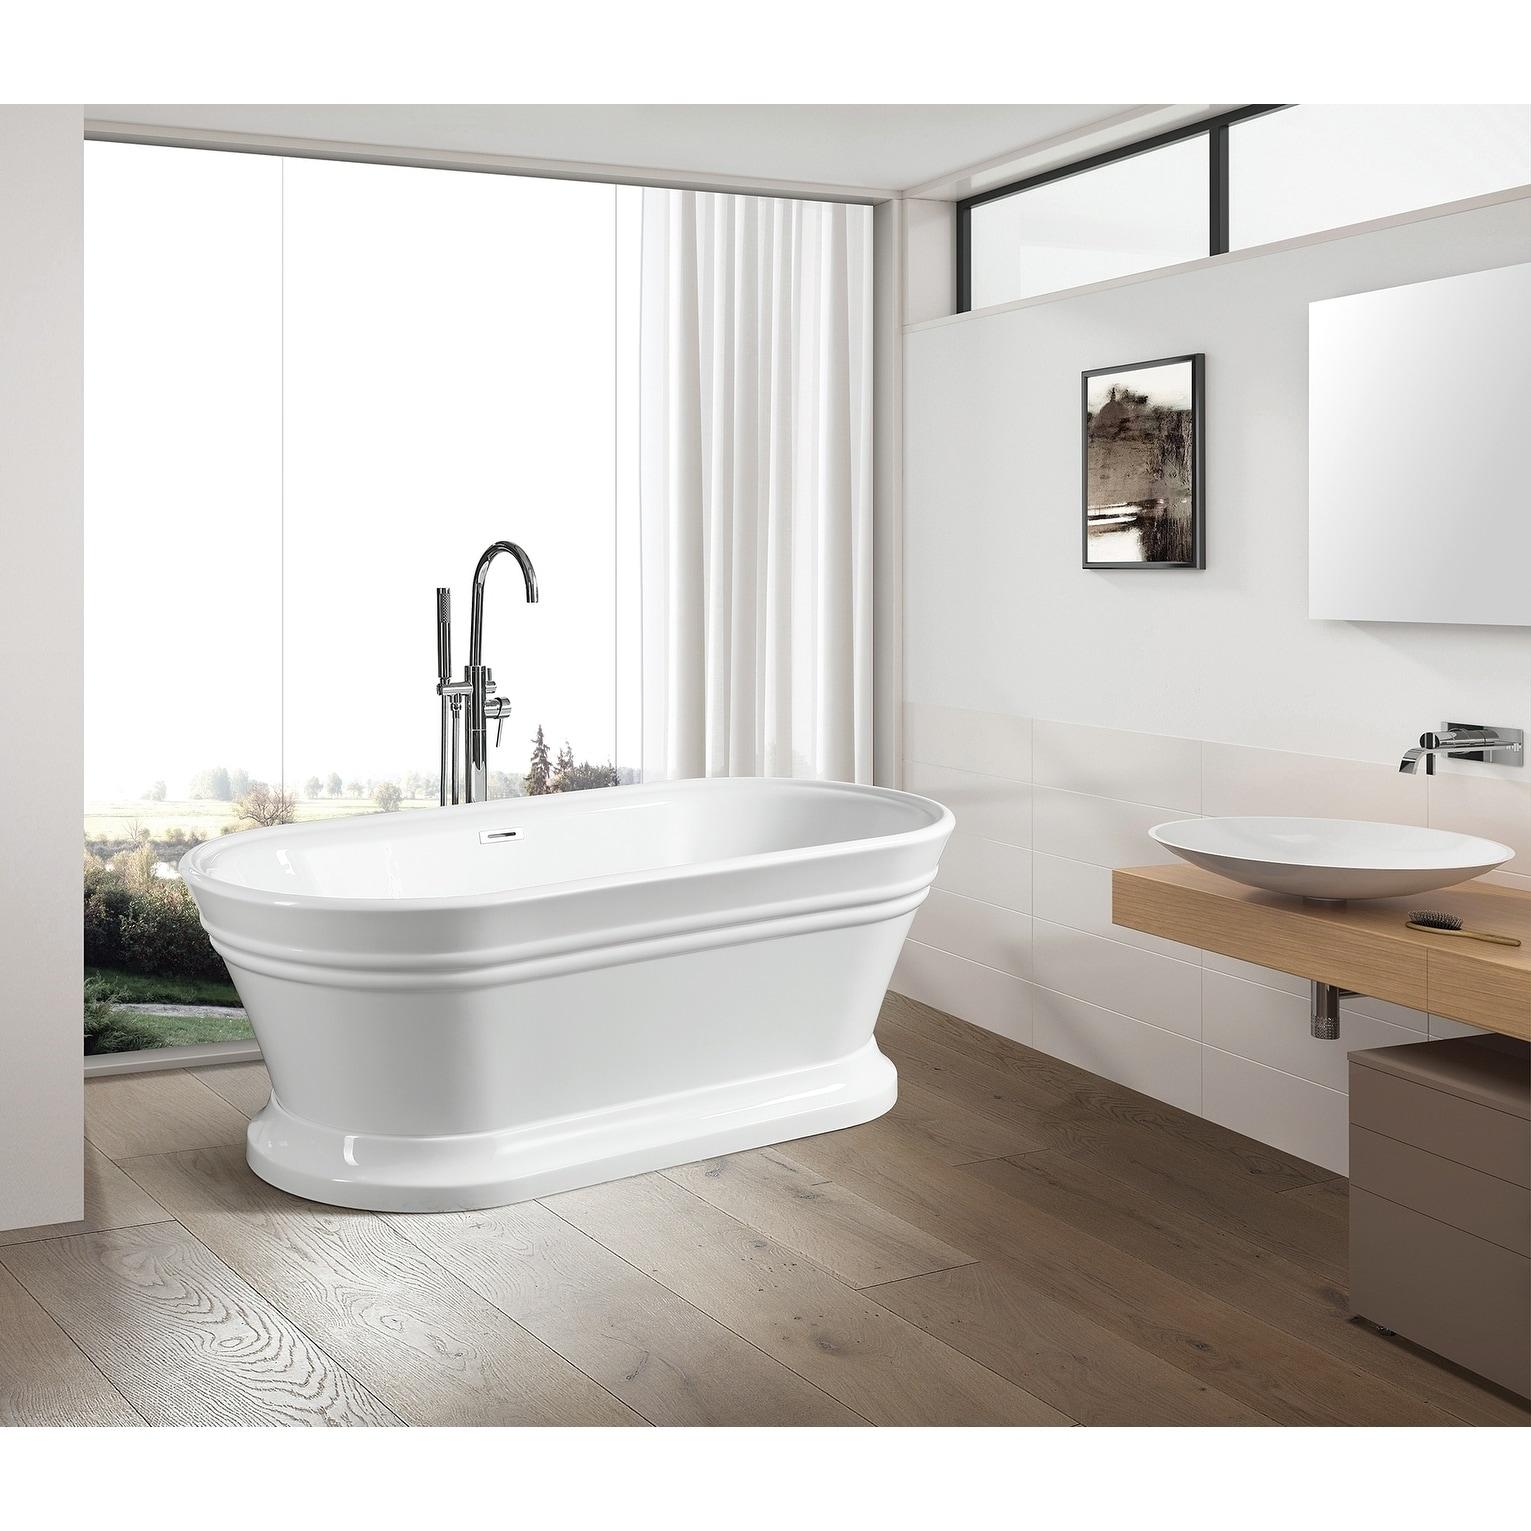 Vanity Art 59 Freestanding White Acrylic Bathtub Modern Stand Alone Soaking Tub With Polished Chrome Overflow Pop Up Drain